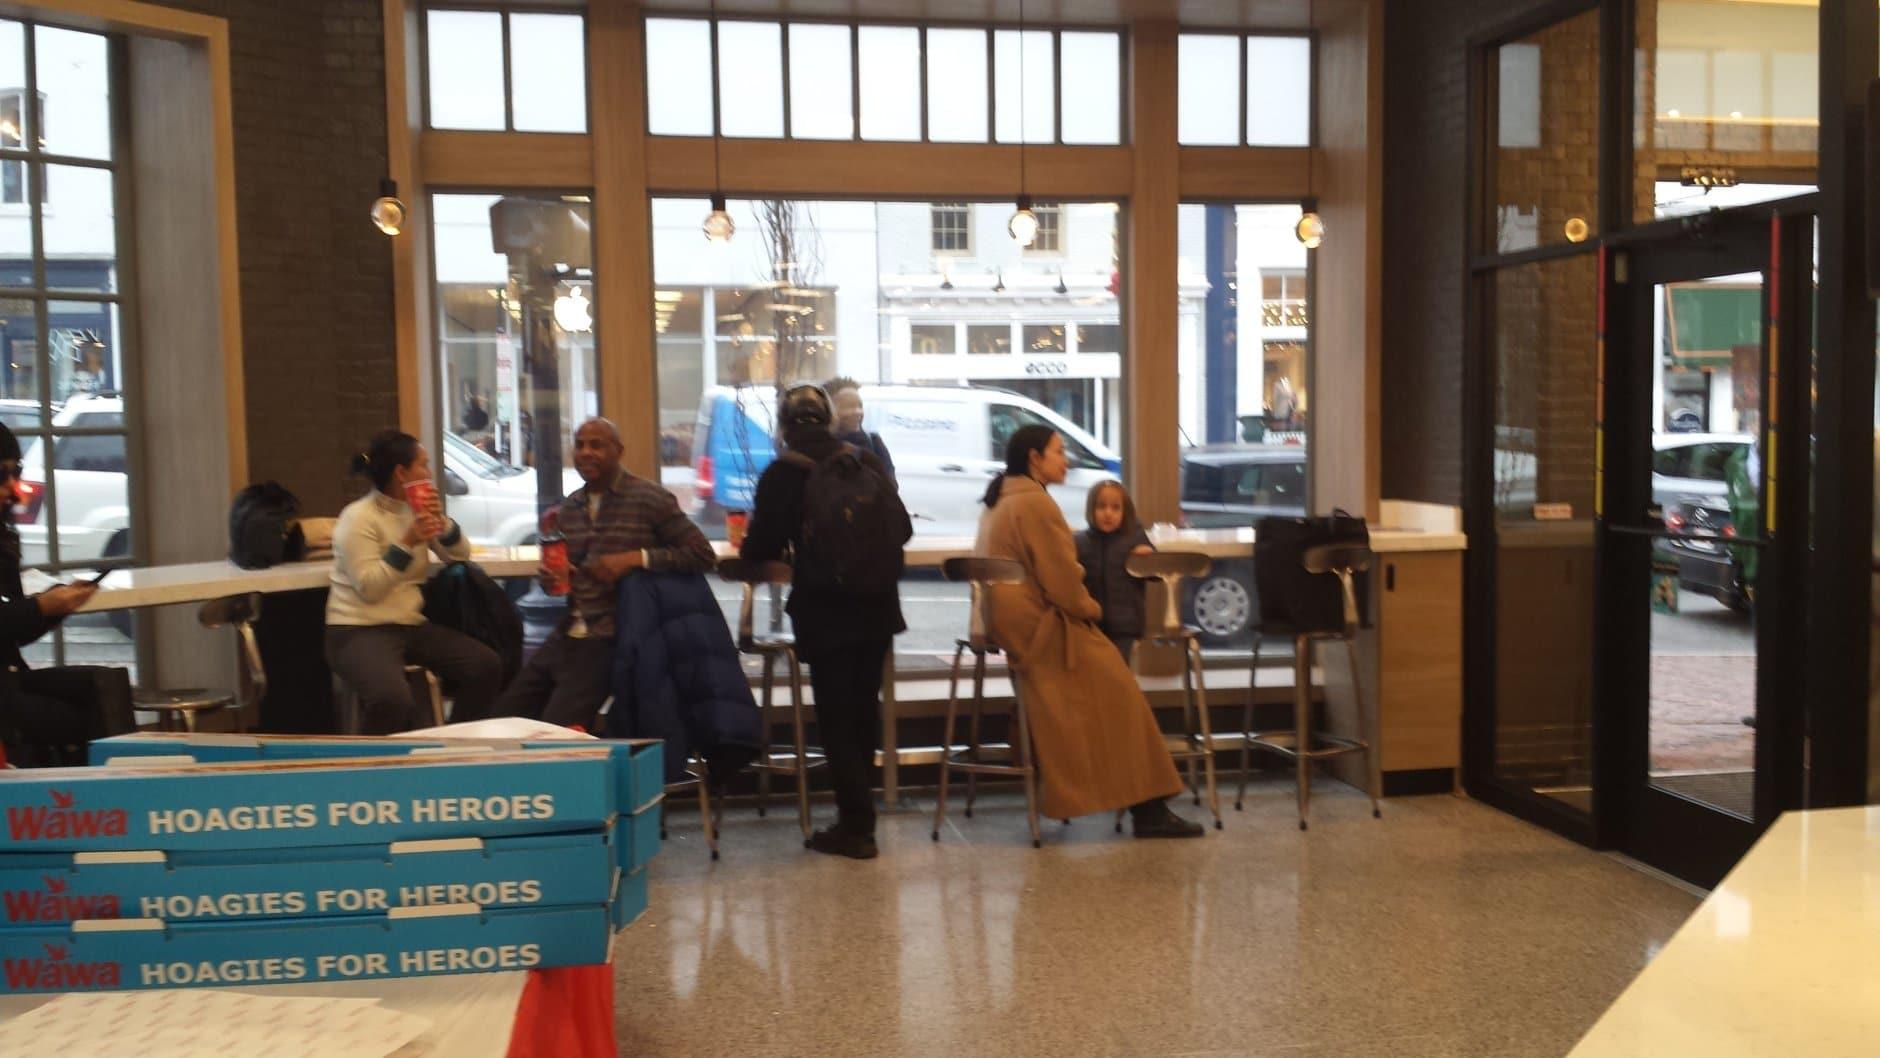 Customers gather inside WAWA's new Georgetown store. A new WAWA will soon open up in Tenleytown. (WTOP/Matt Ritter)